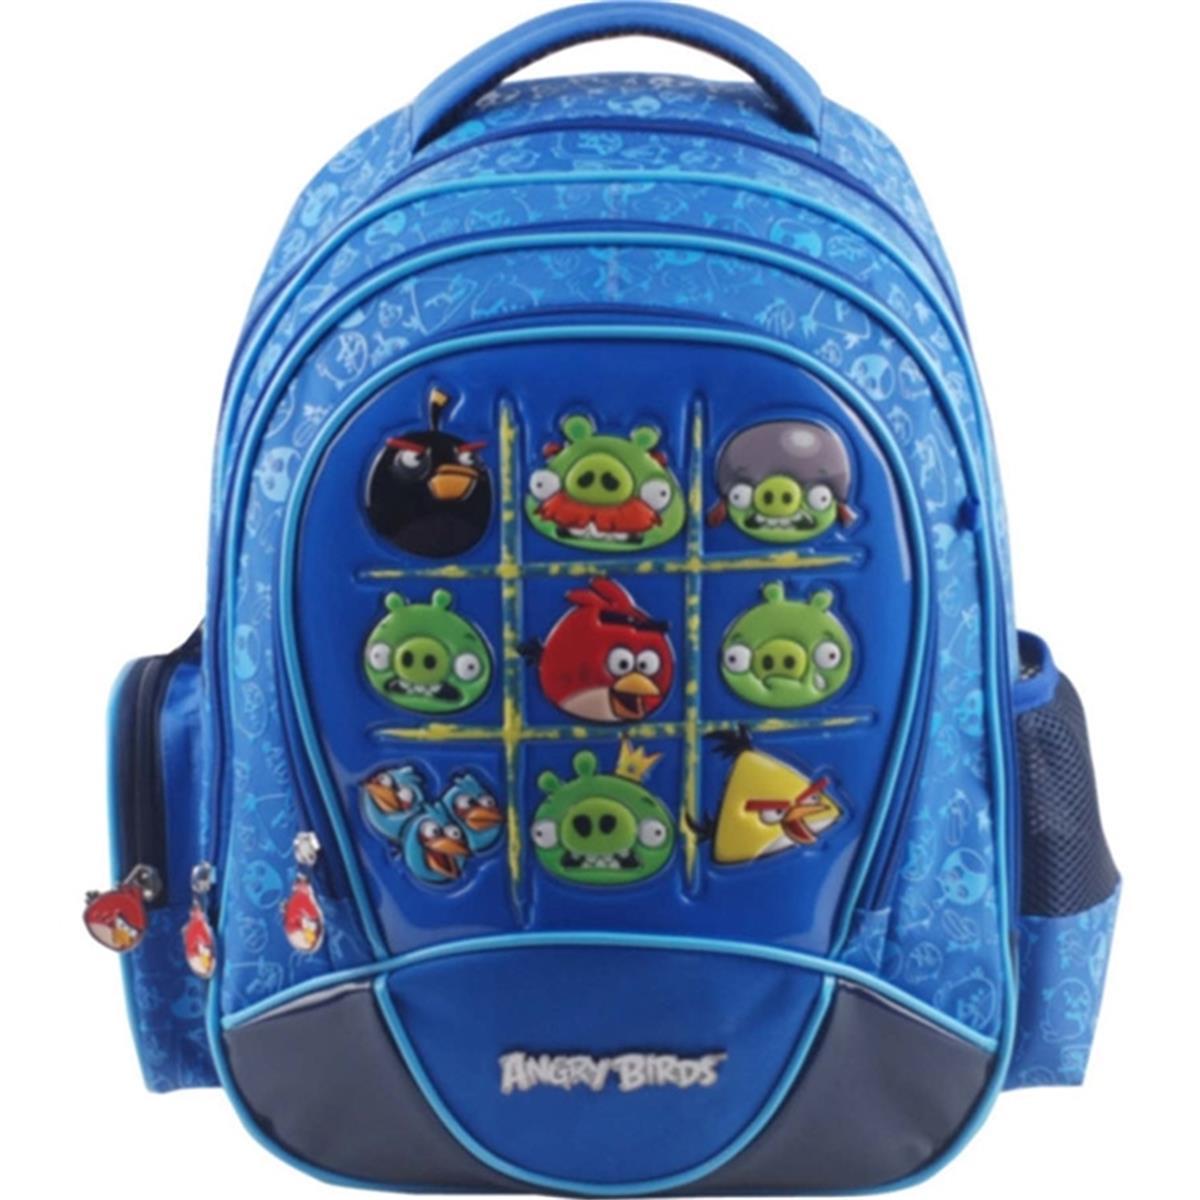 b2f014dba Mochila Costas Angry Birds Escolar Azul ABM13006U22 Santino